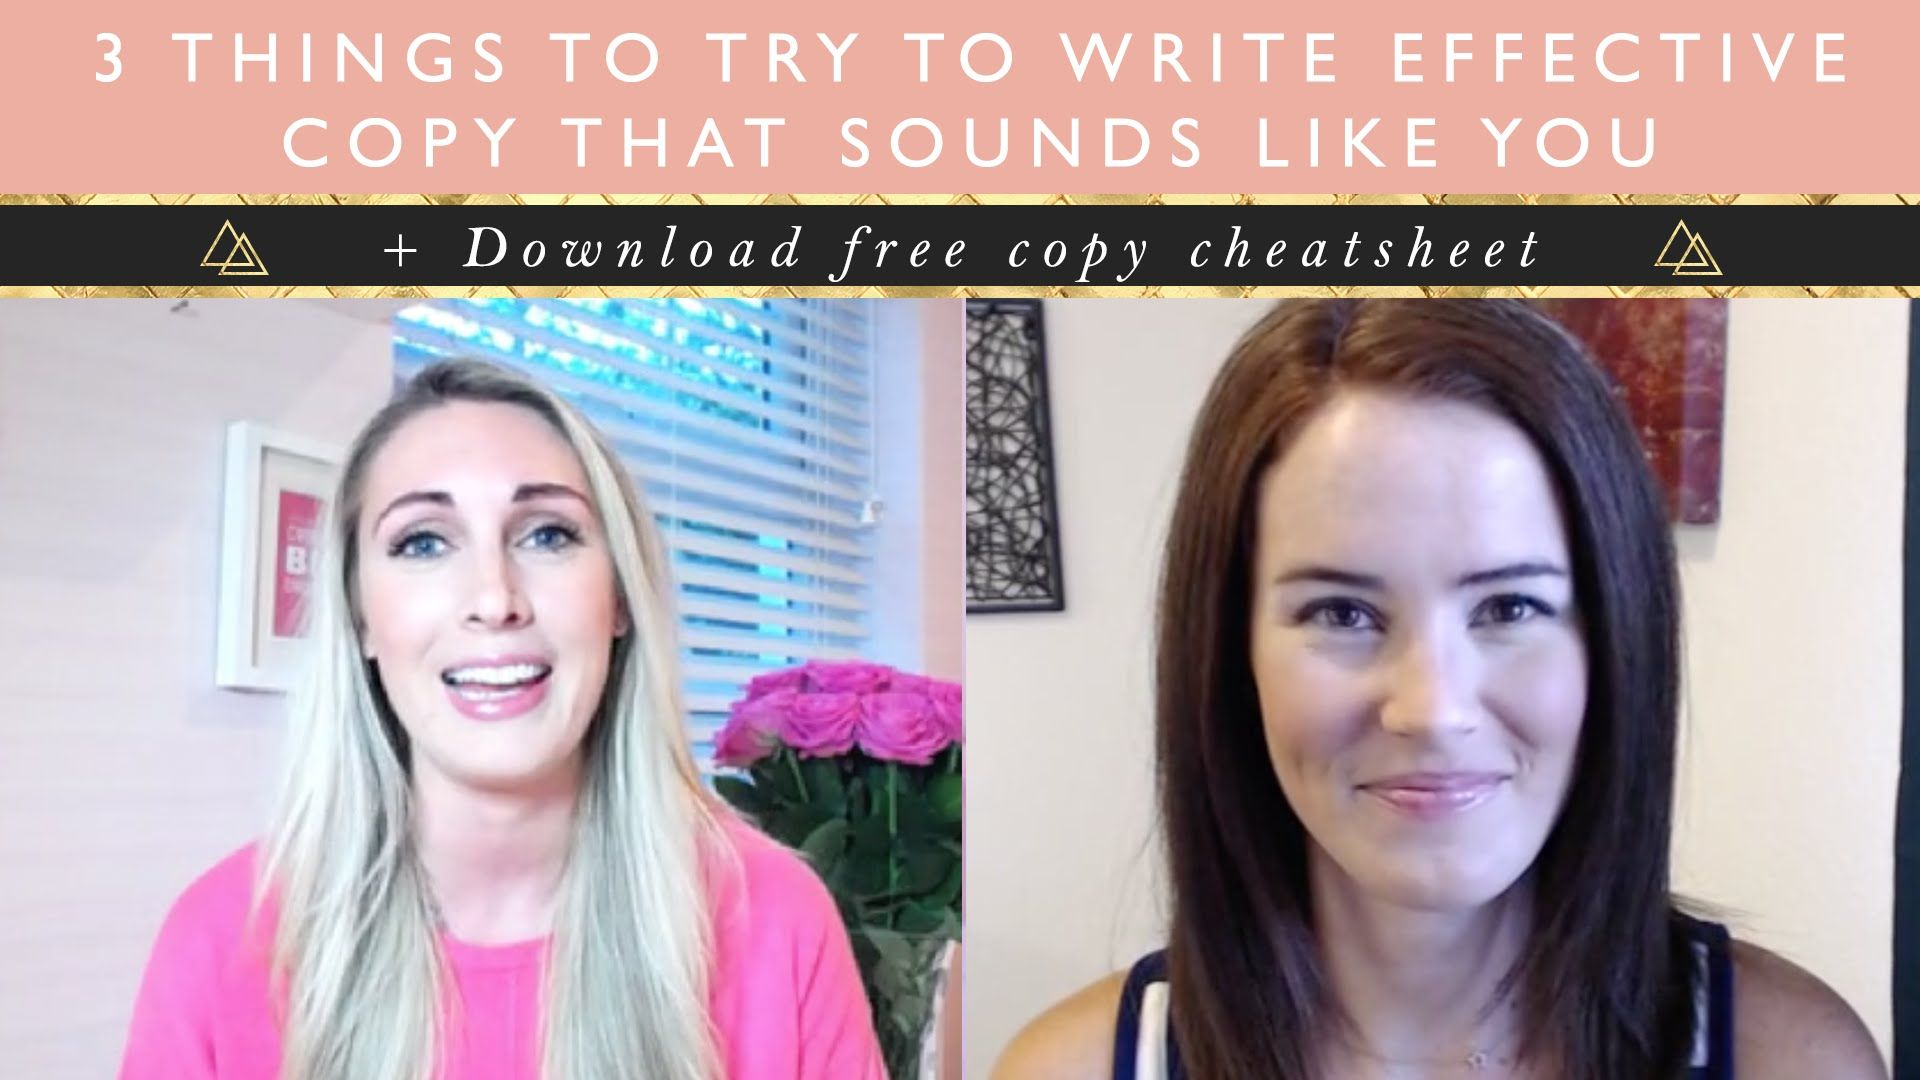 How to write effective copy that sounds like YOU + free cheatsheet